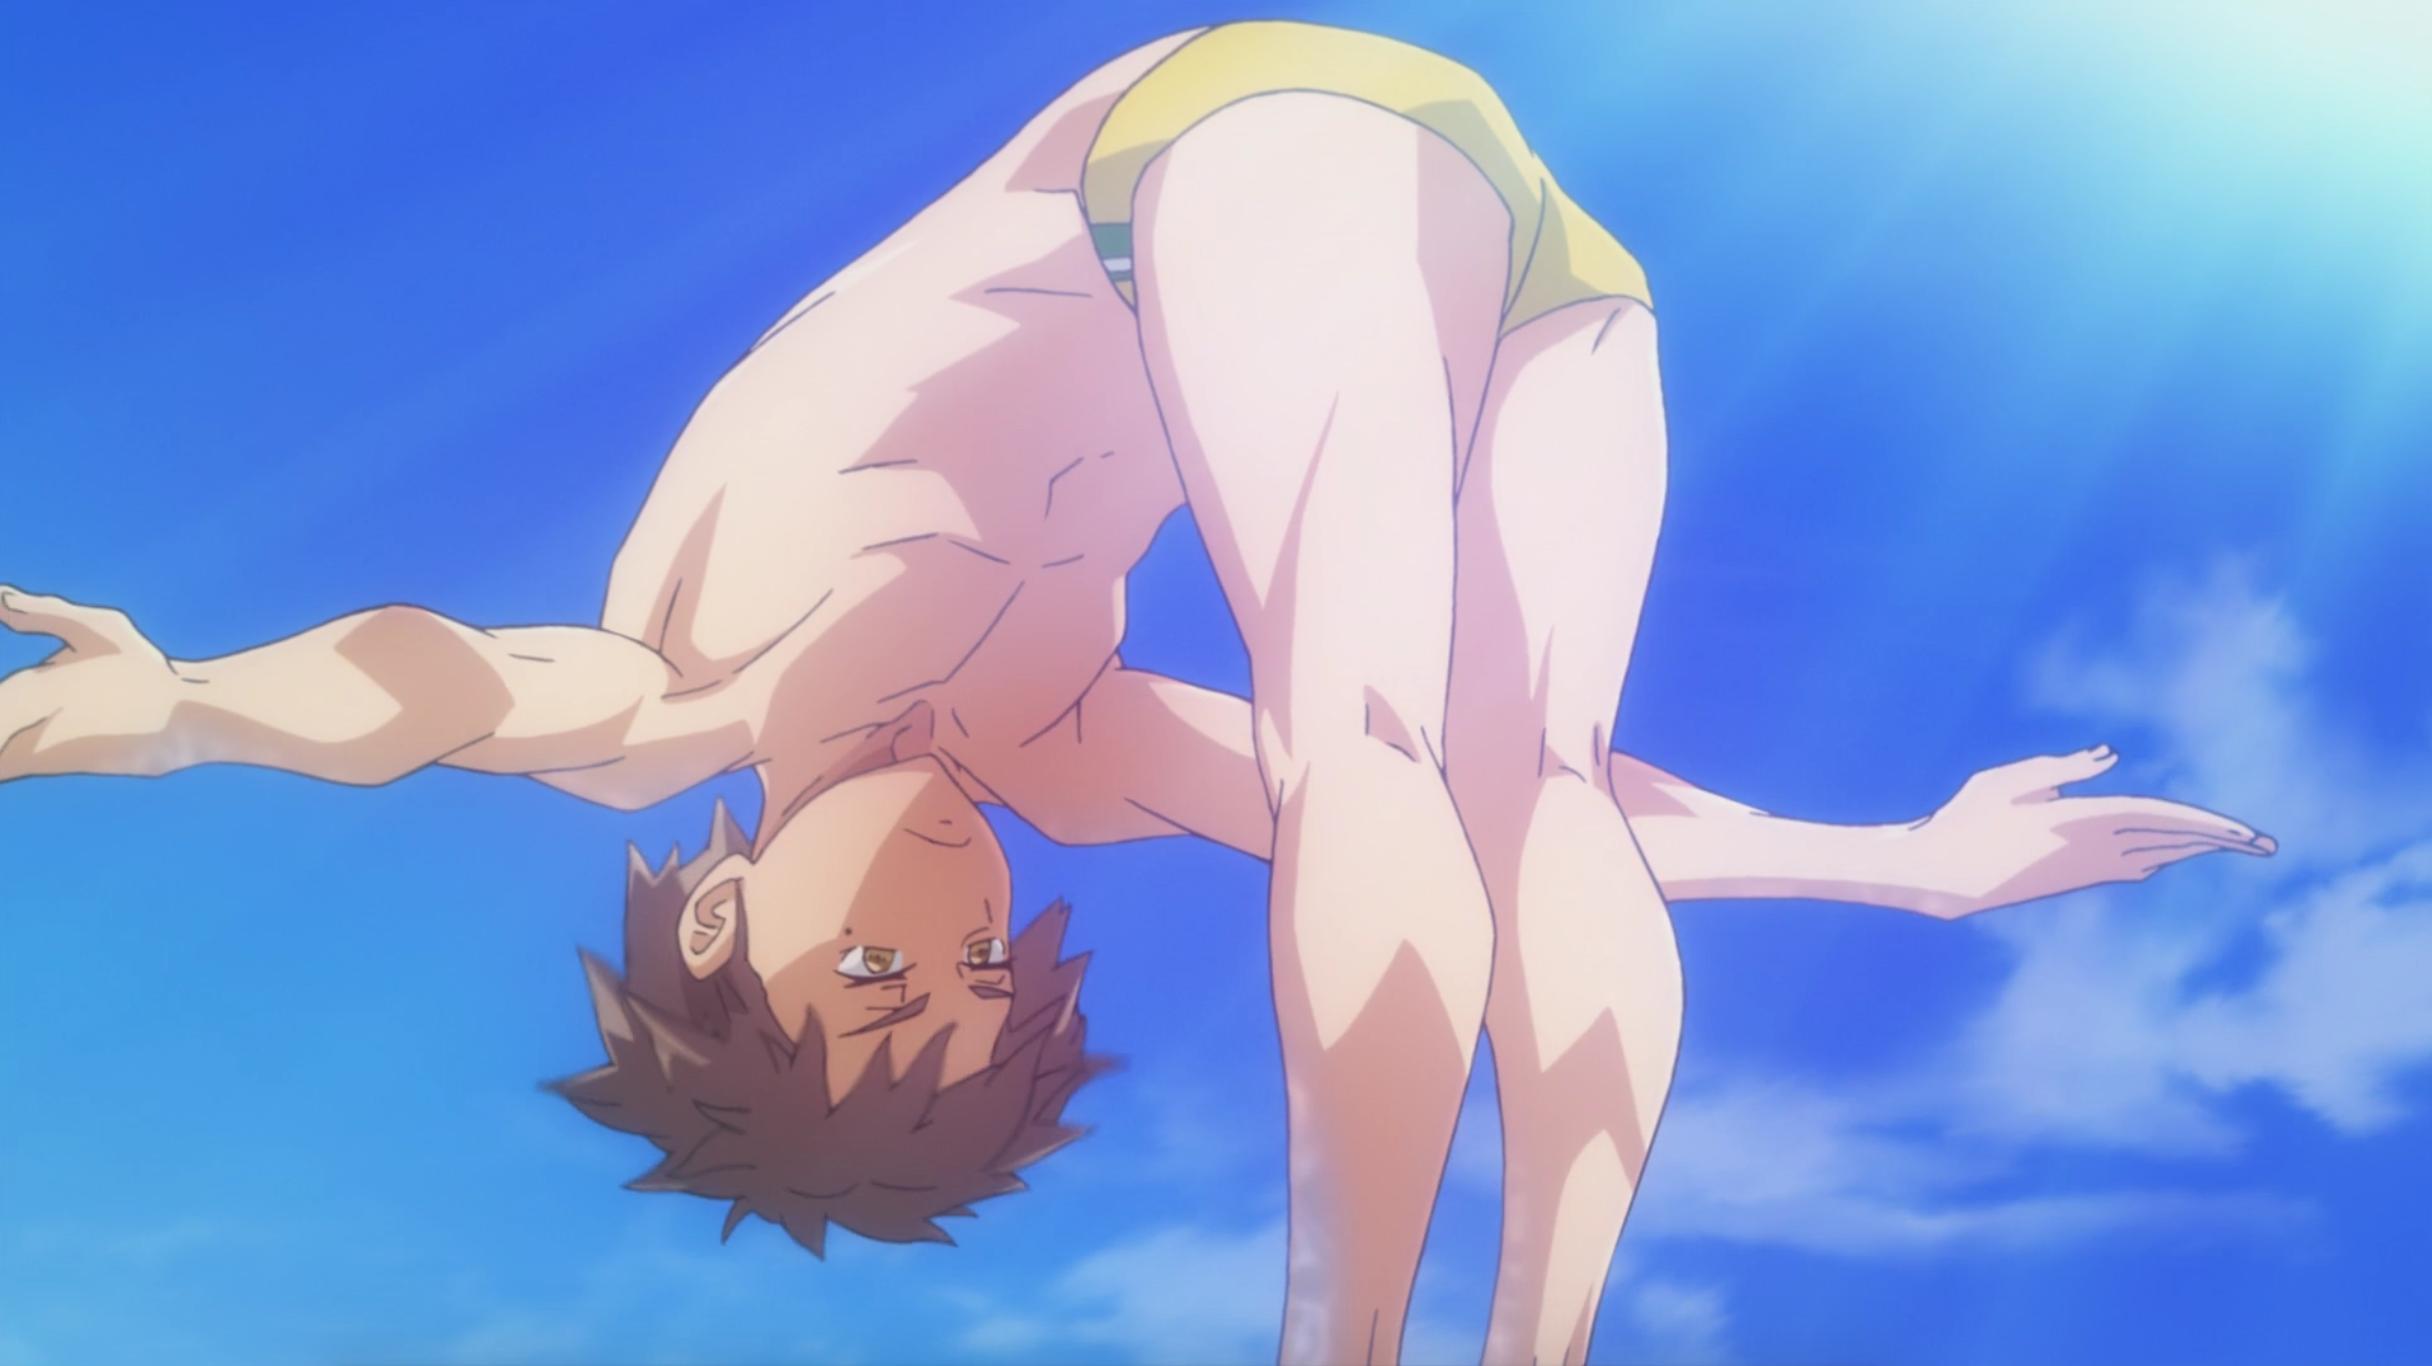 Yoichi flips off the diving board